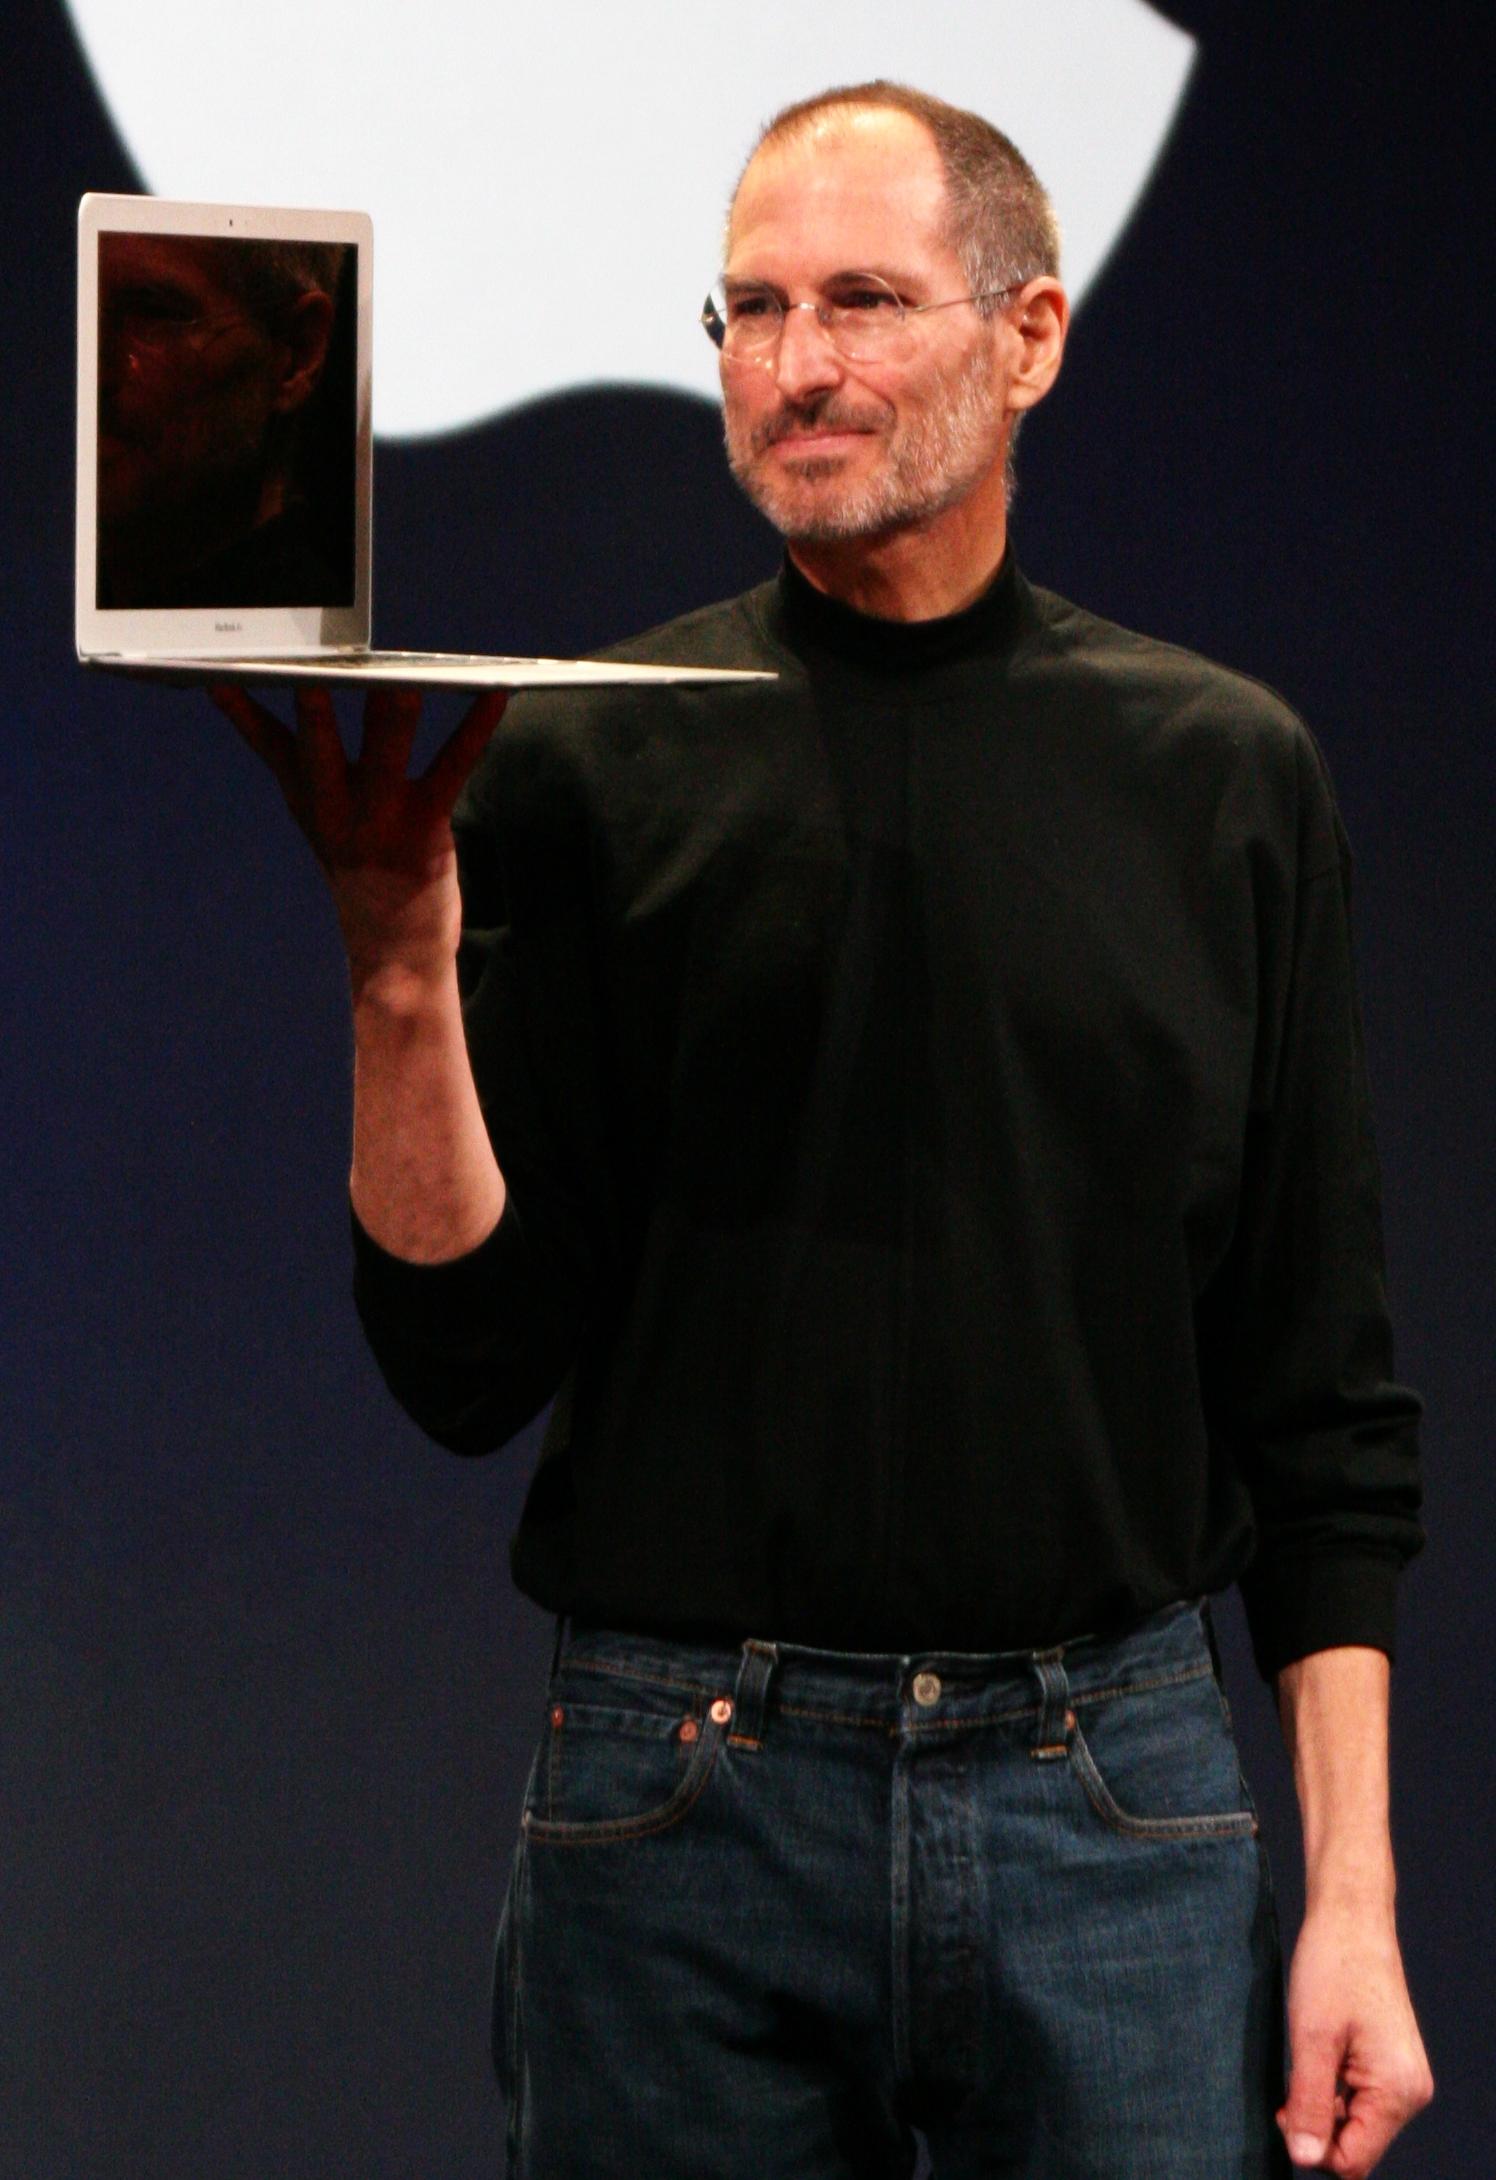 Steve Jobs, fondateur d'Apple.